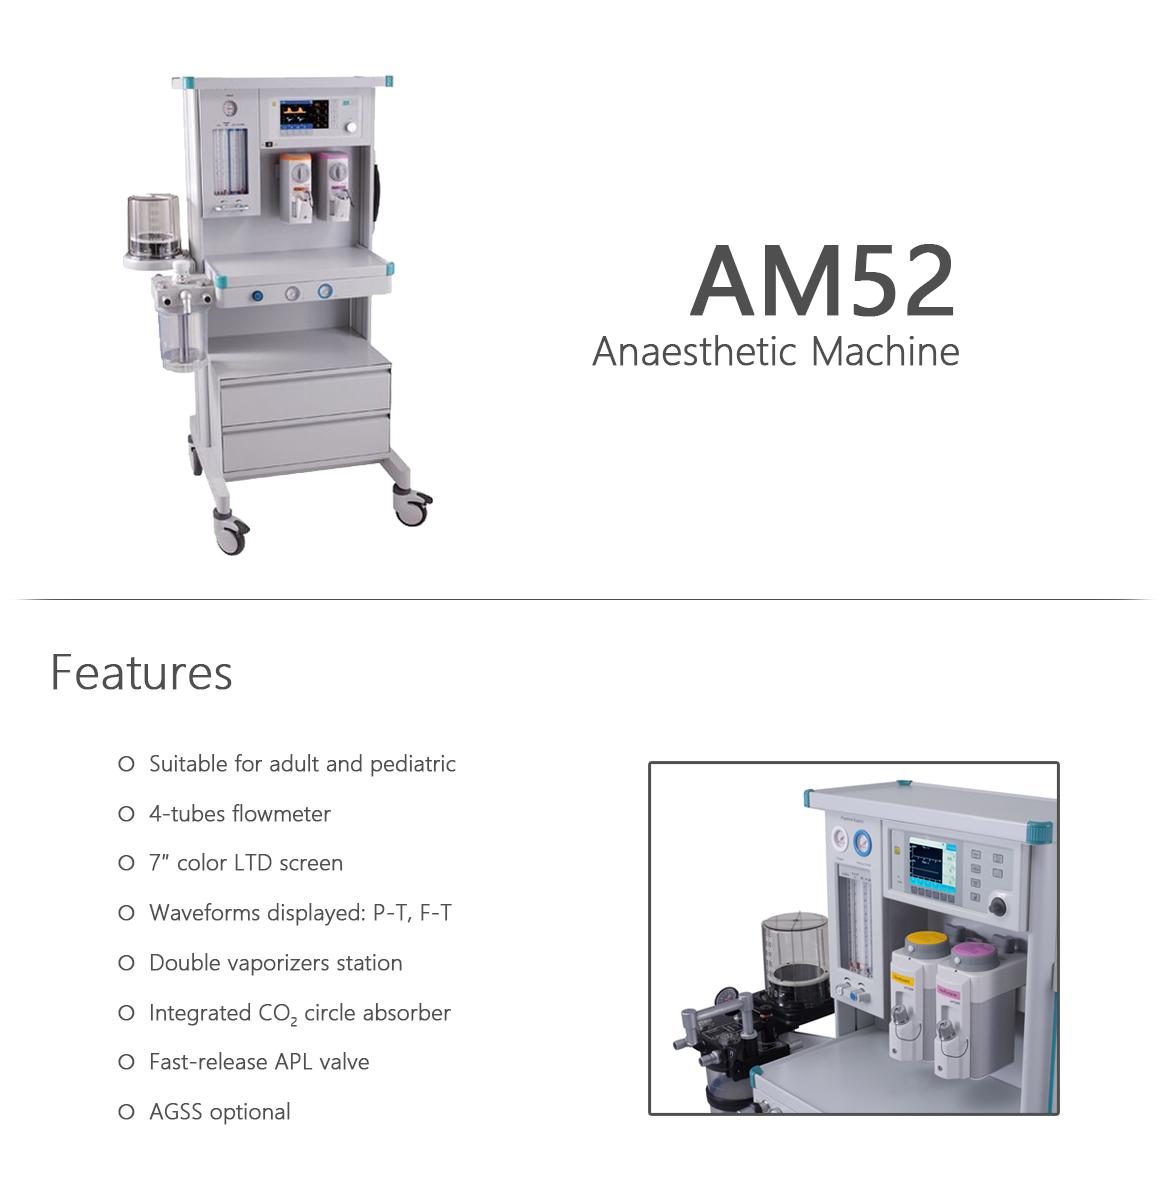 Am52 anaesthetic machine